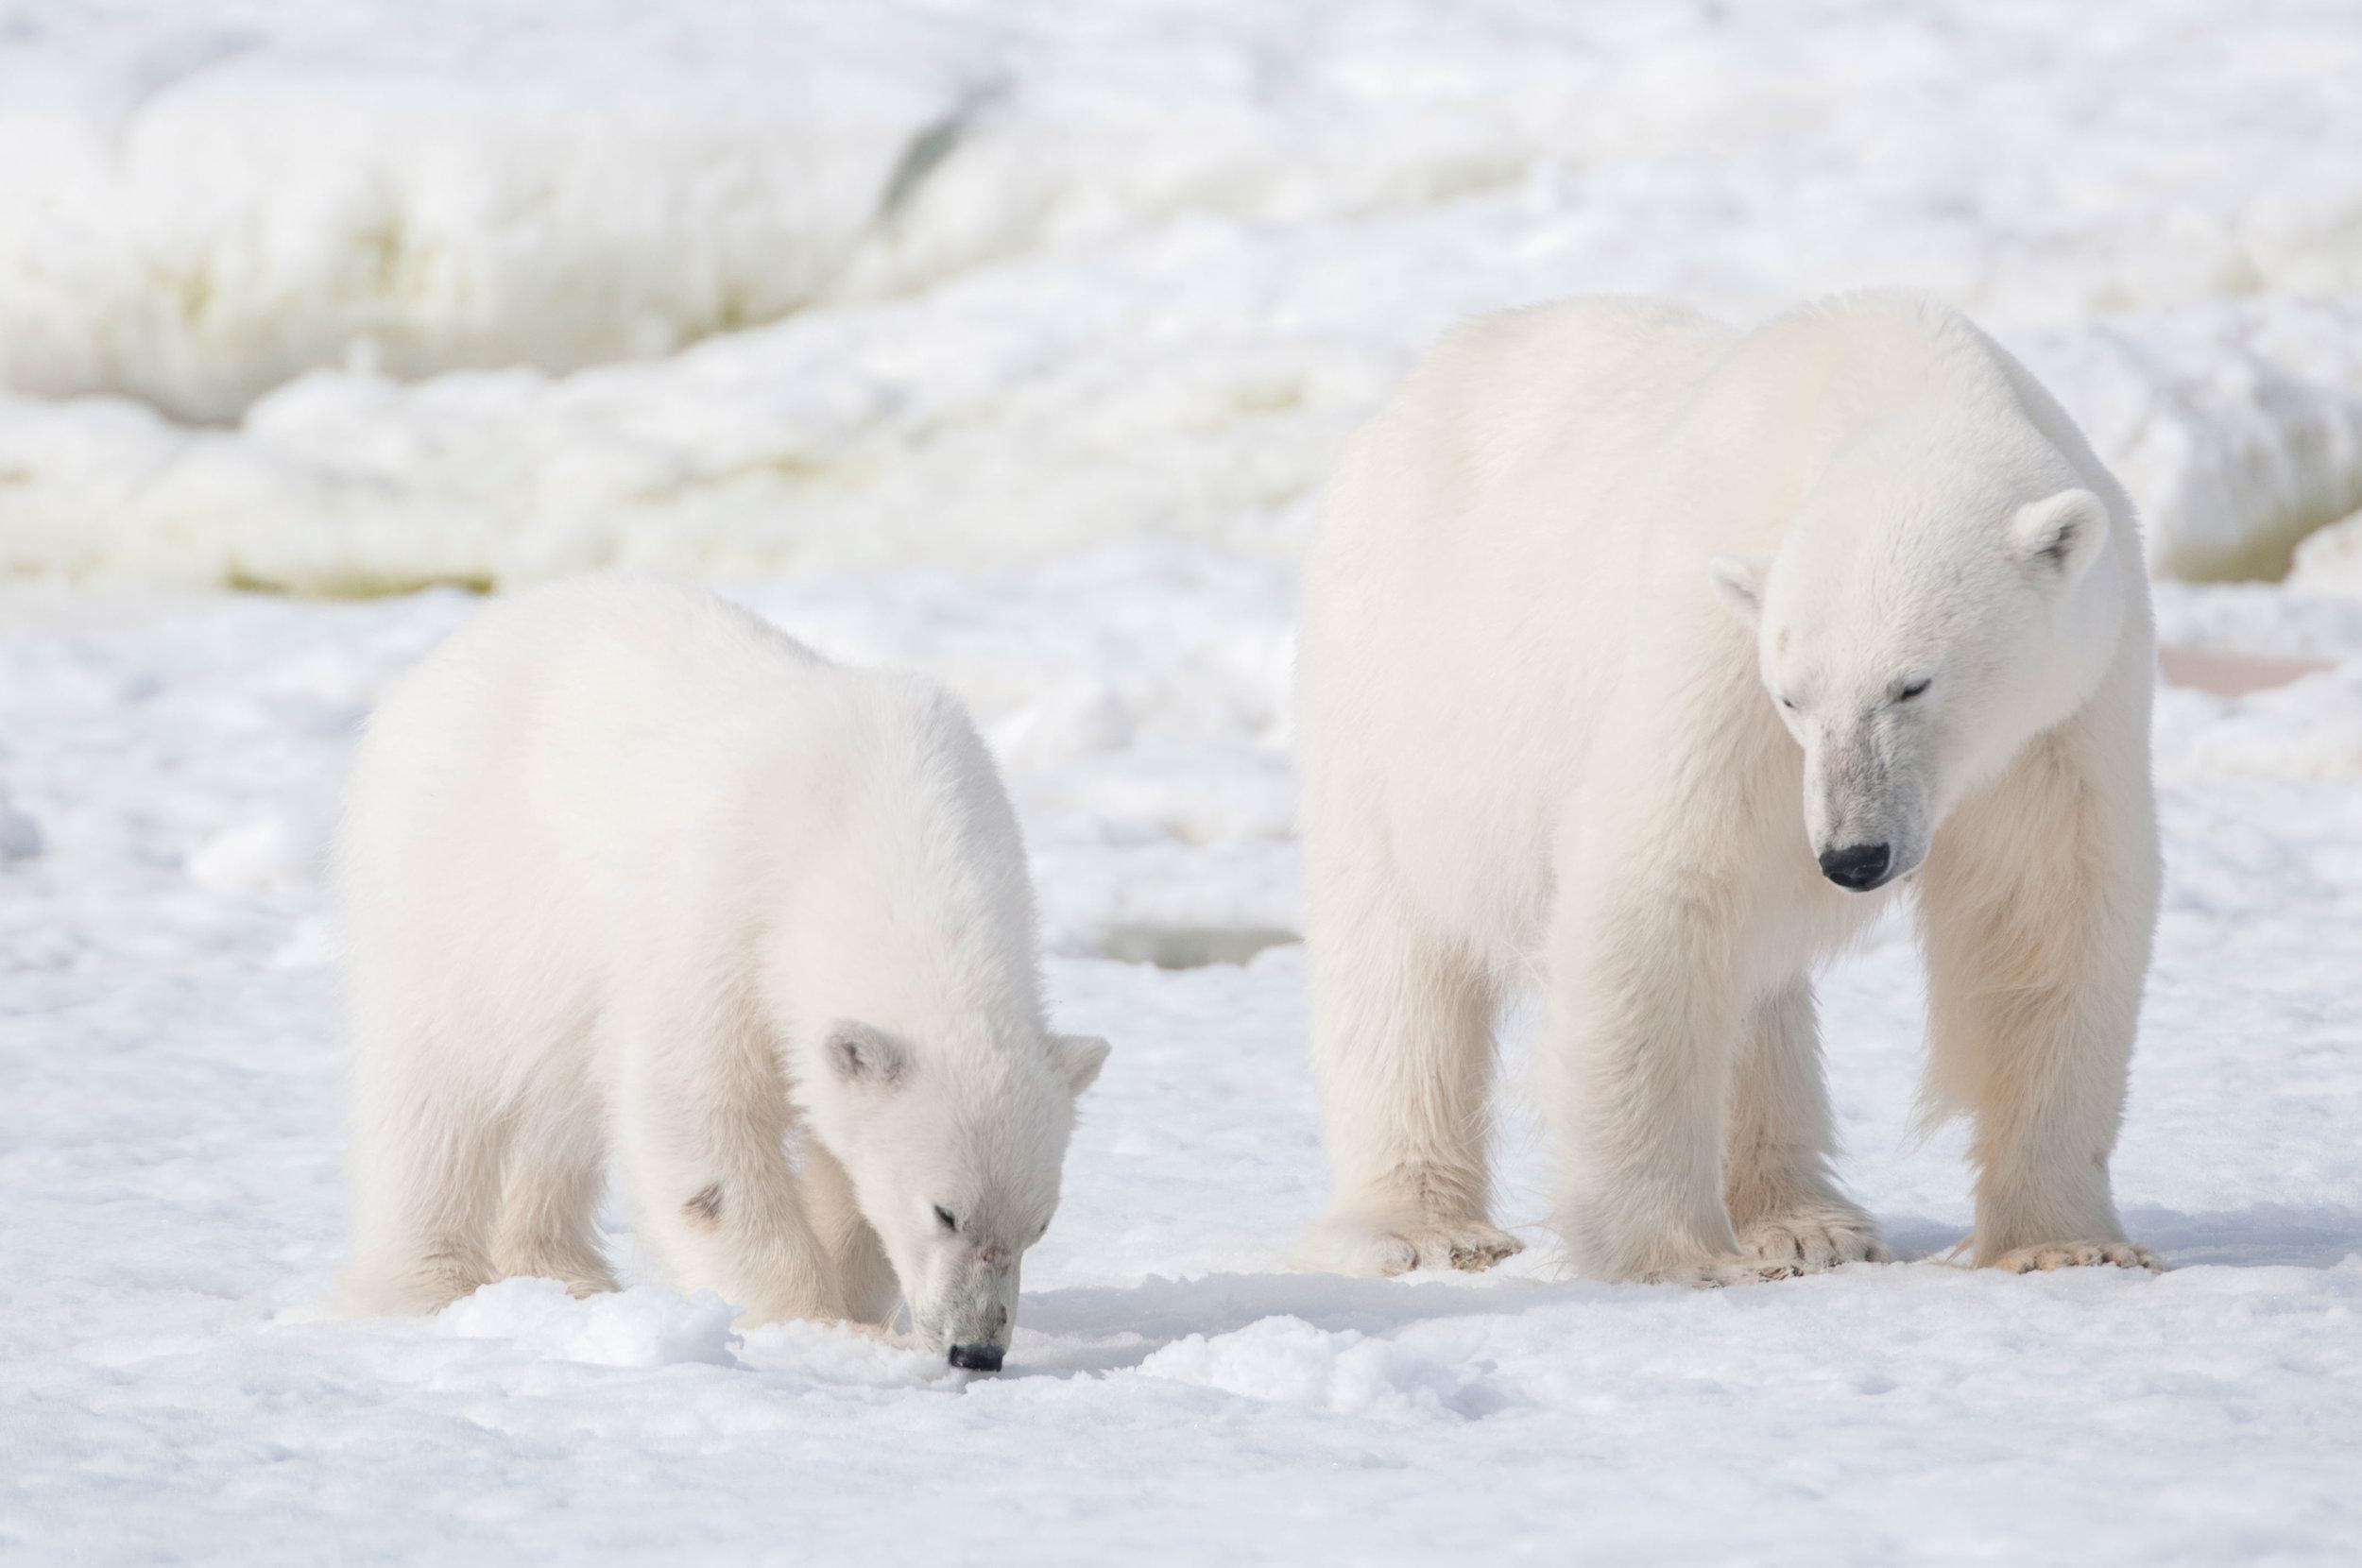 arctic-polarbears-sallyhamna-spitsbergen-plancius-©-Josh-Harrison.jpg_Josh-Harrison.jpg